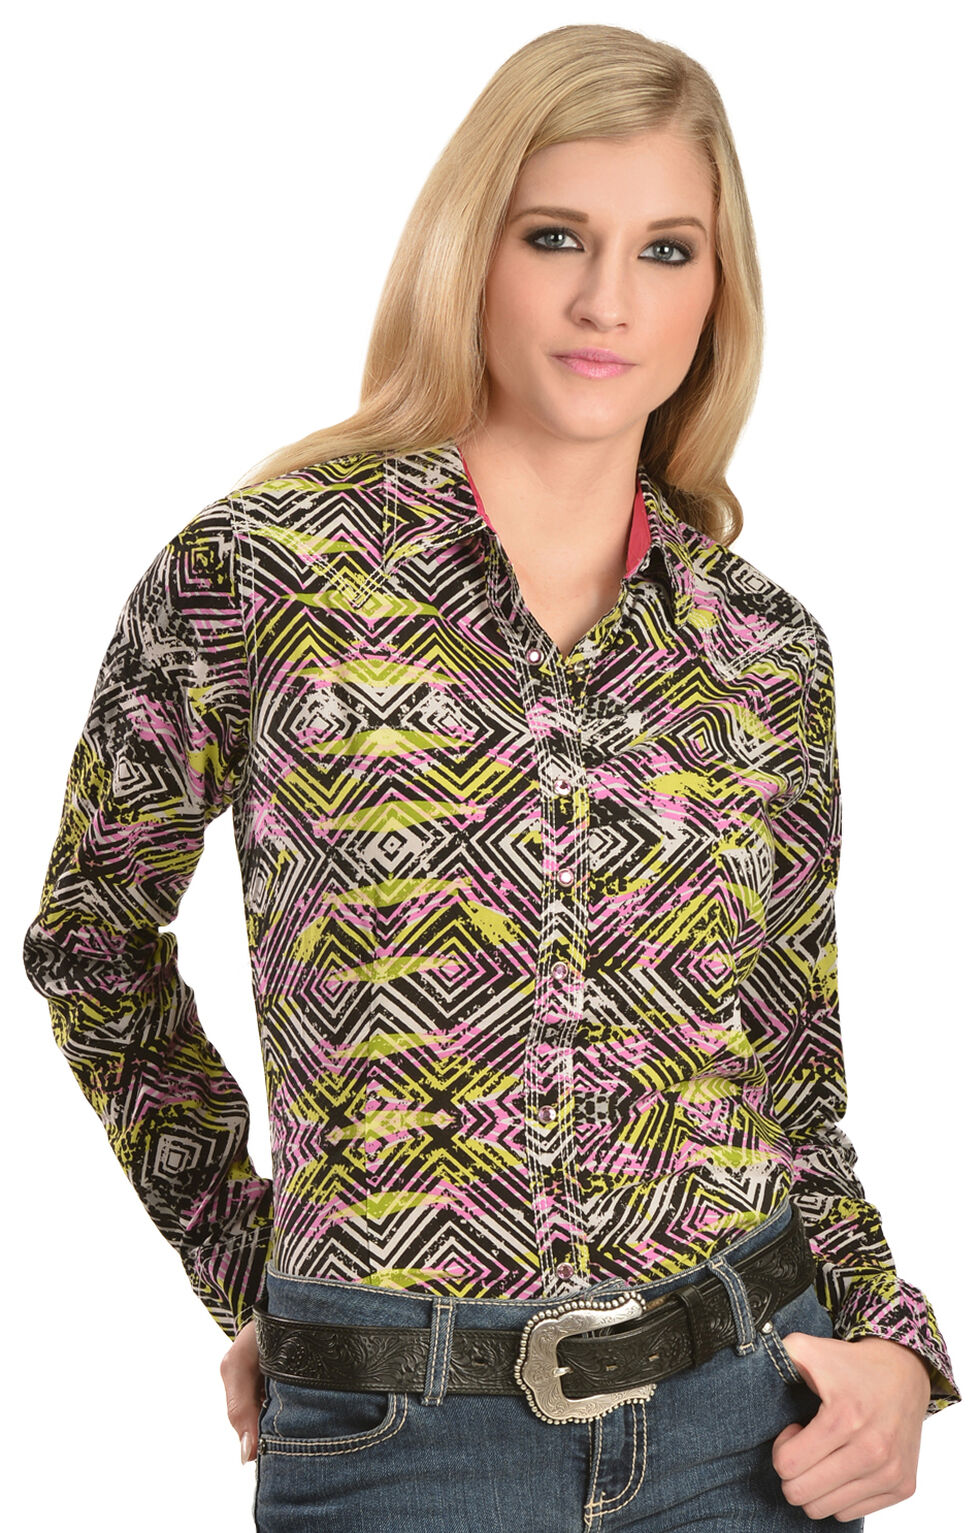 Wrangler Rock 47 Women's Geo Print Western Shirt, Black, hi-res